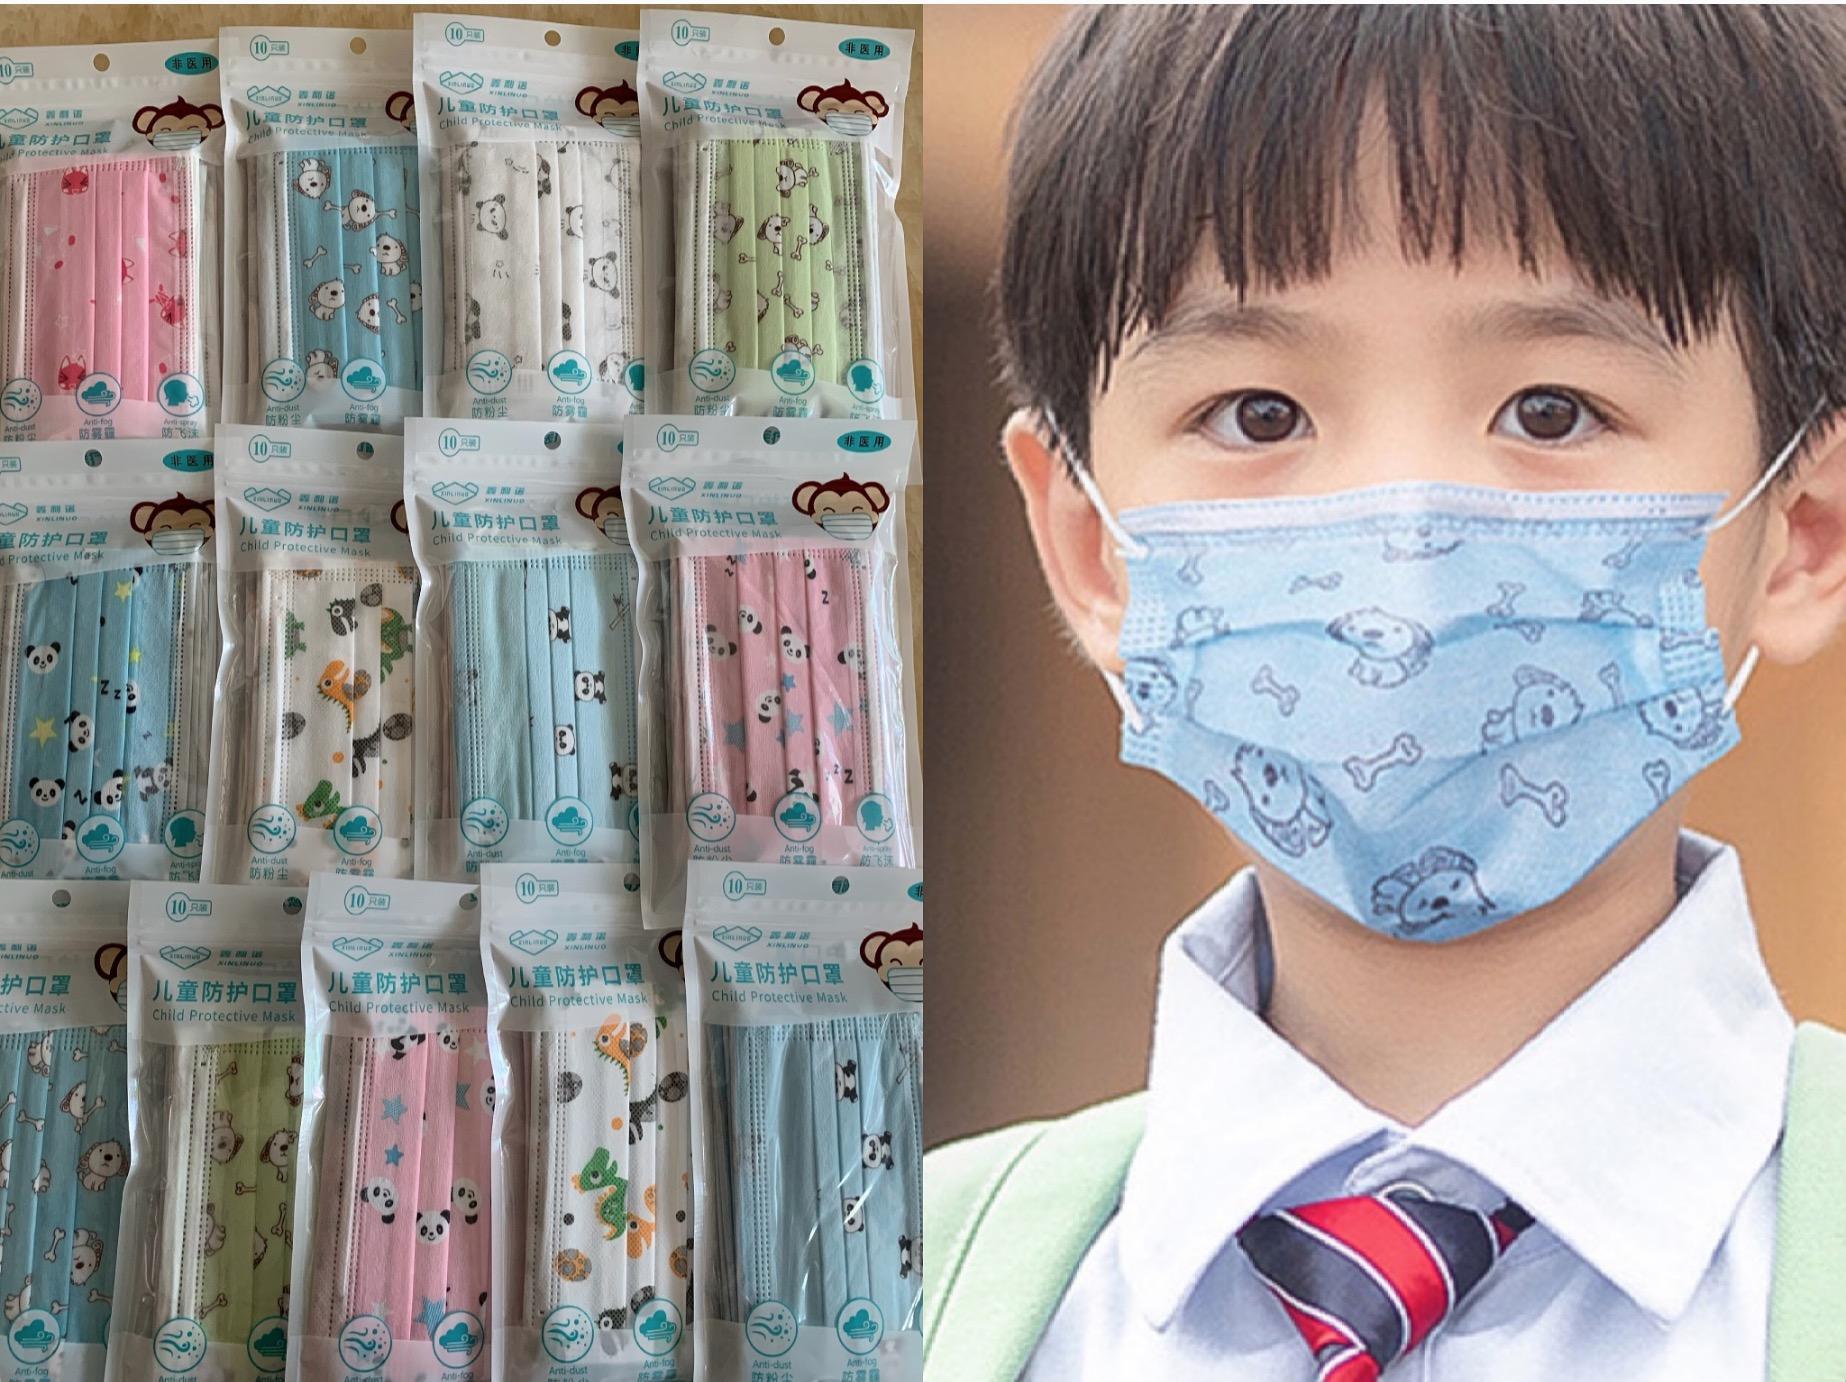 Máscaras de dibujos animados niños 10pcs / máscara facial diseñador bolso de la cara Moda Niño Máscara niños de 3 capas de máscara desechable 1d nave Kid bucal de protección